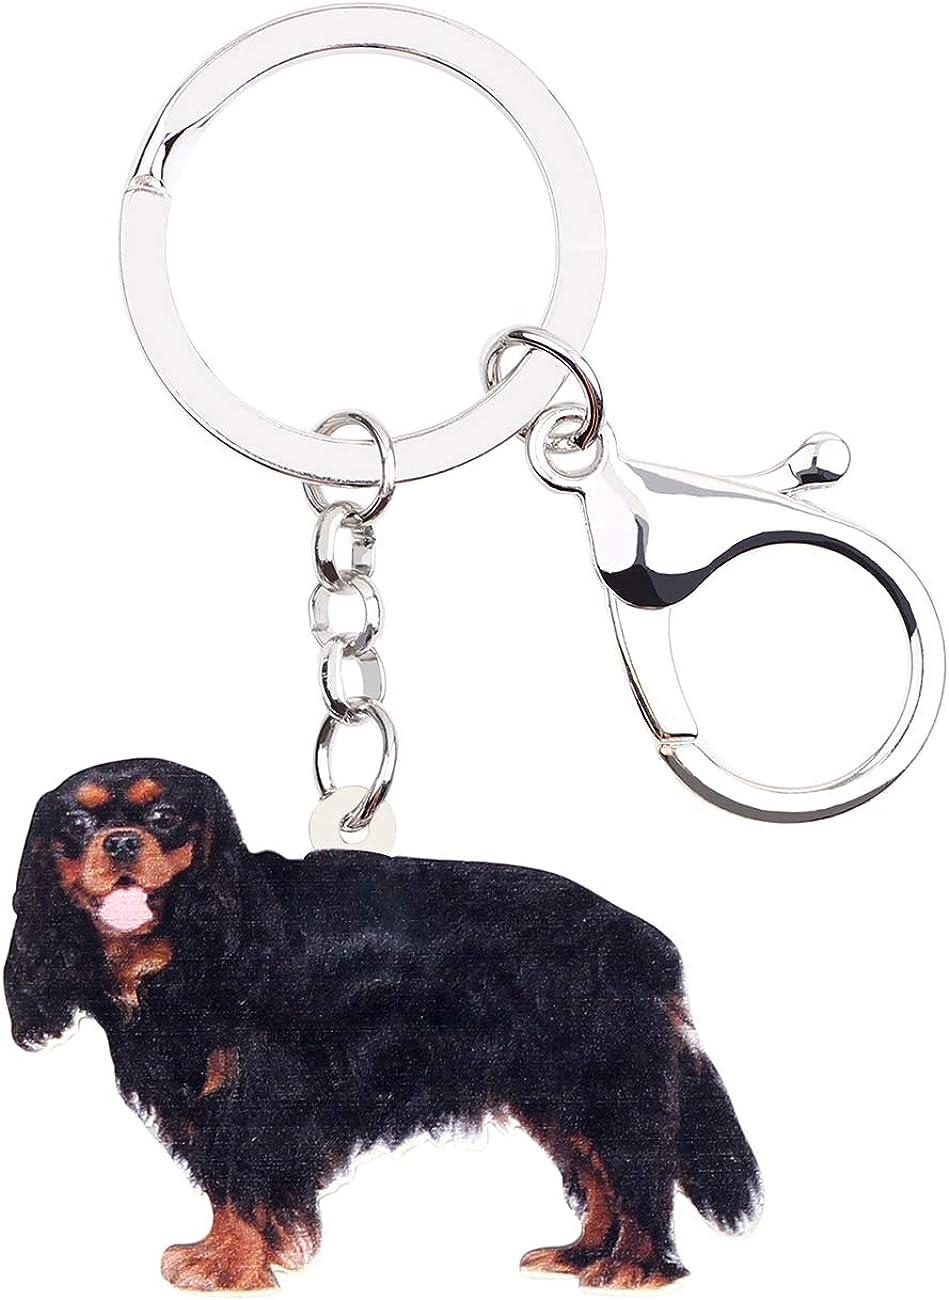 WEVENI JEWELRY WEVENI Acrylic Black Cavalier King Charles Spaniel Dog Keychains Pets Key Ring For Women Girls Bag Purse Car, 32mm x 46mm